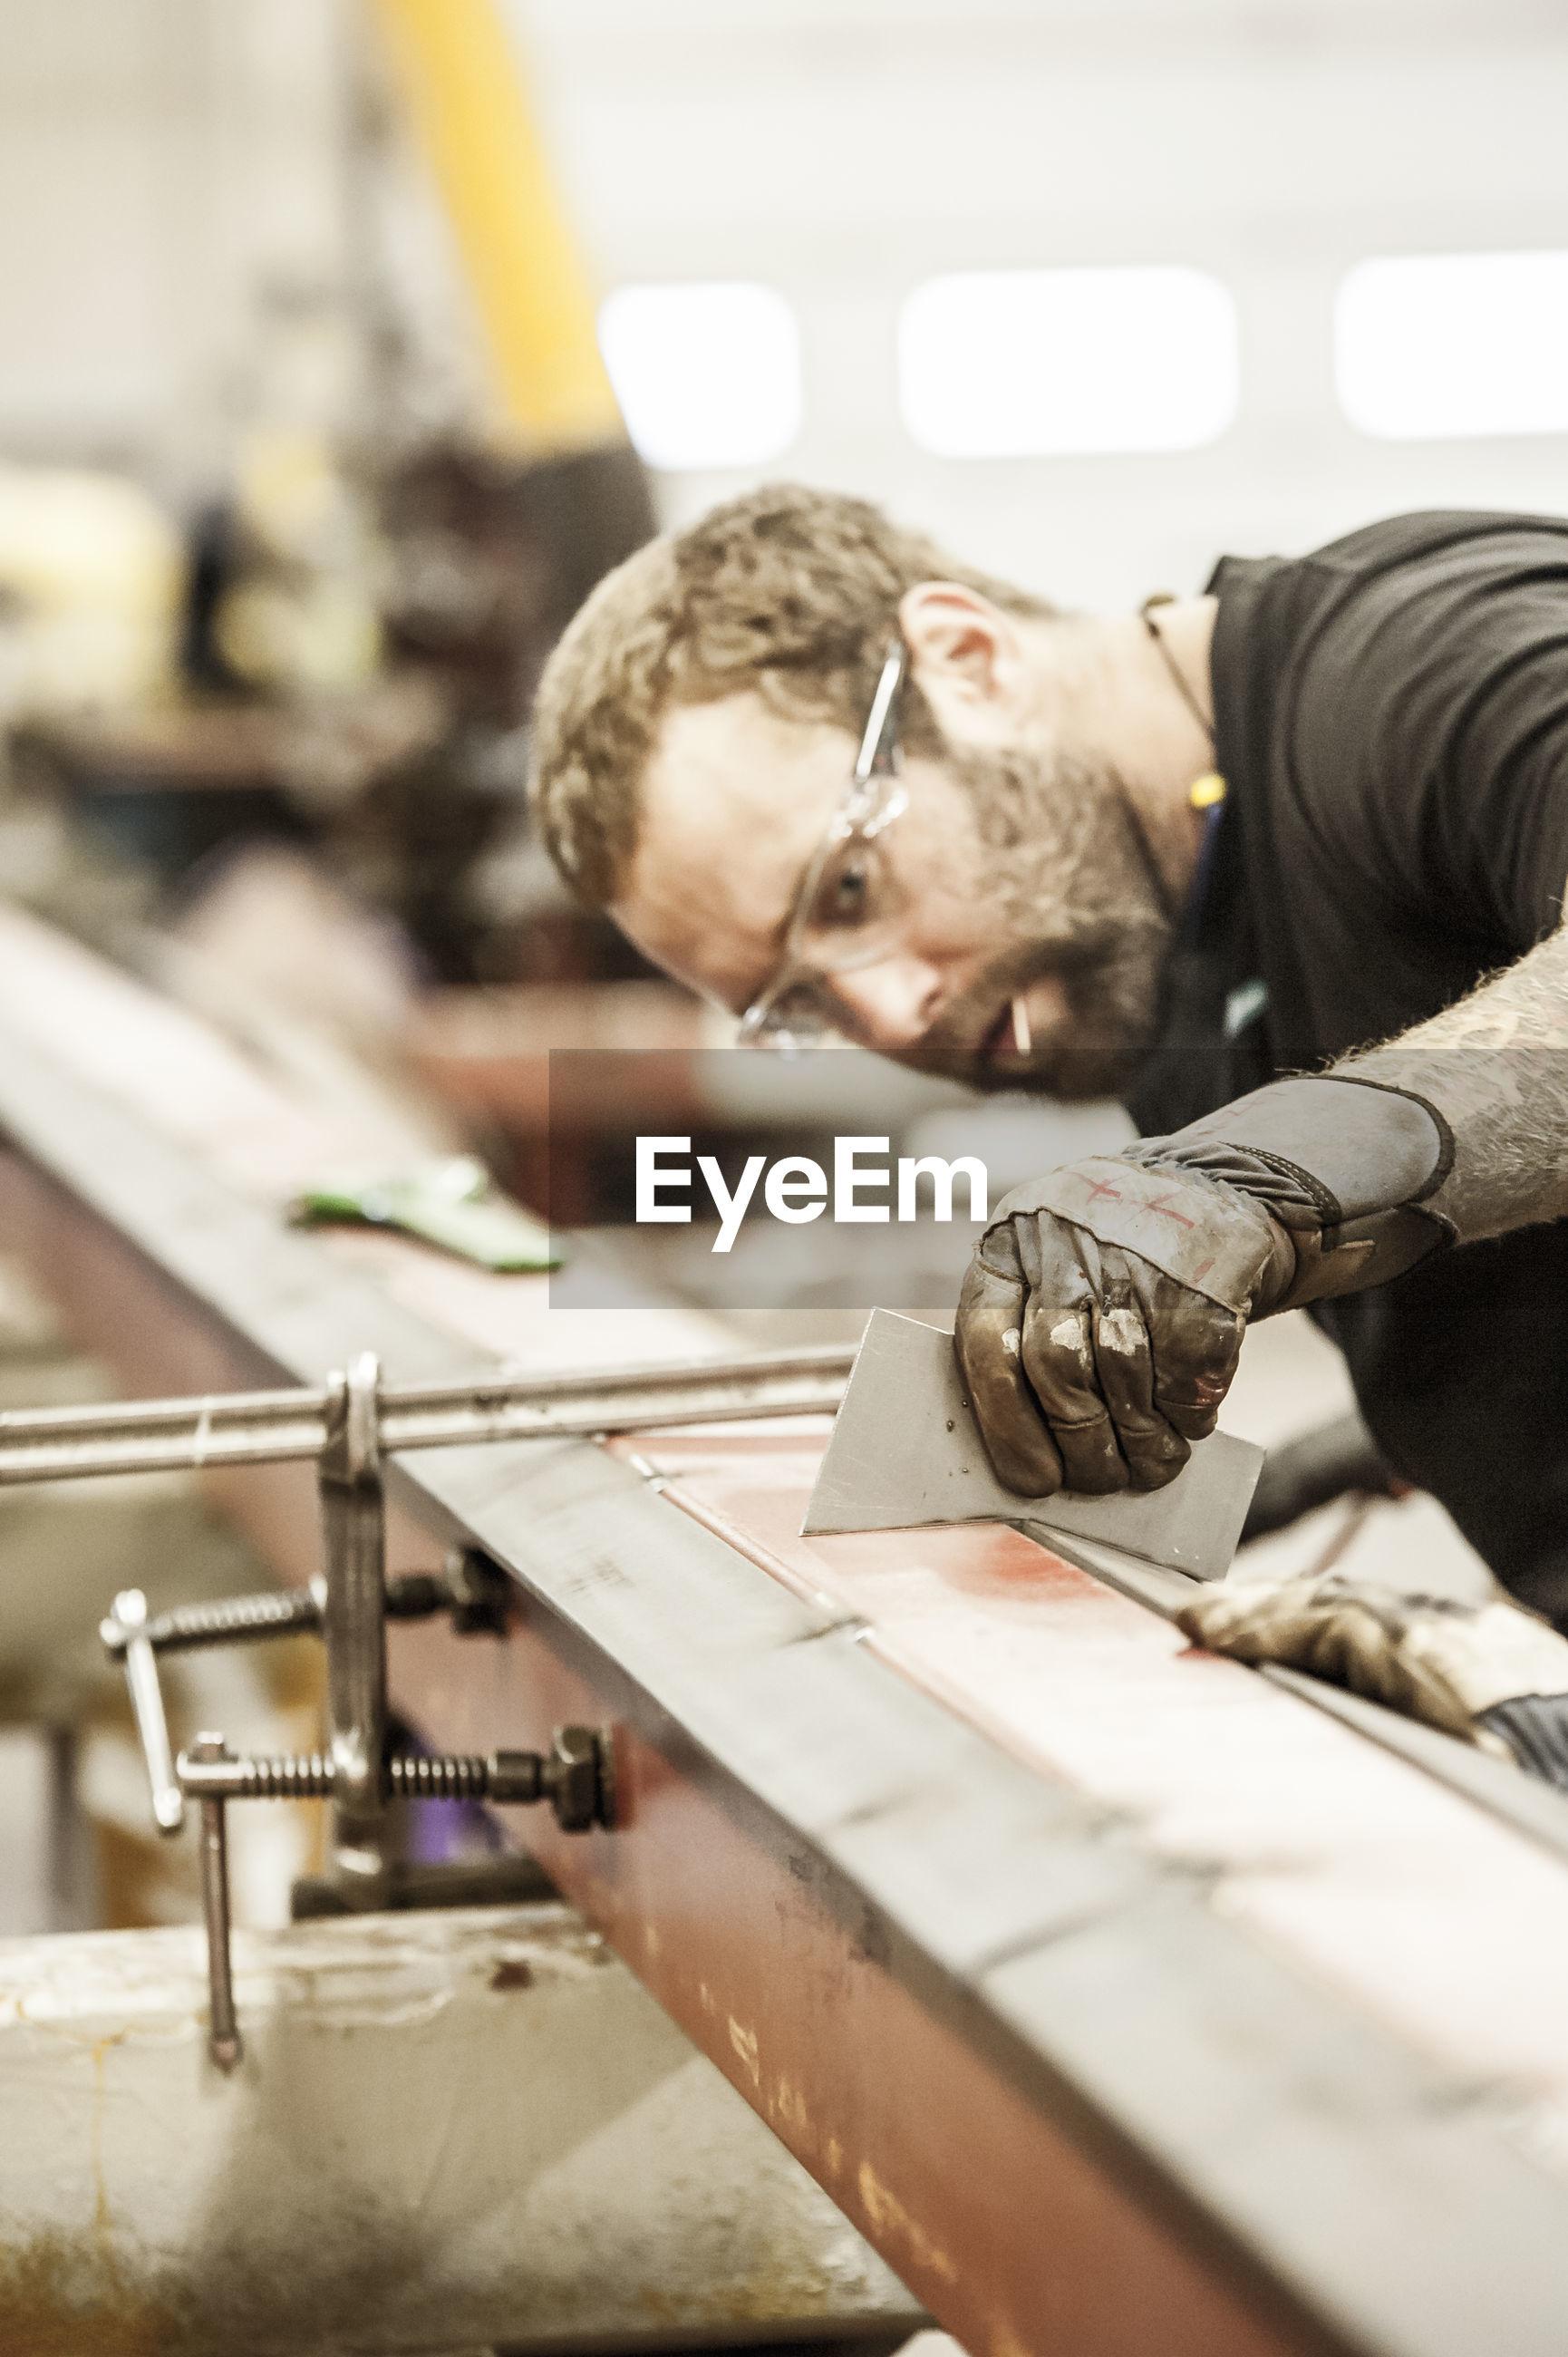 PORTRAIT OF MAN WORKING ON DISPLAY